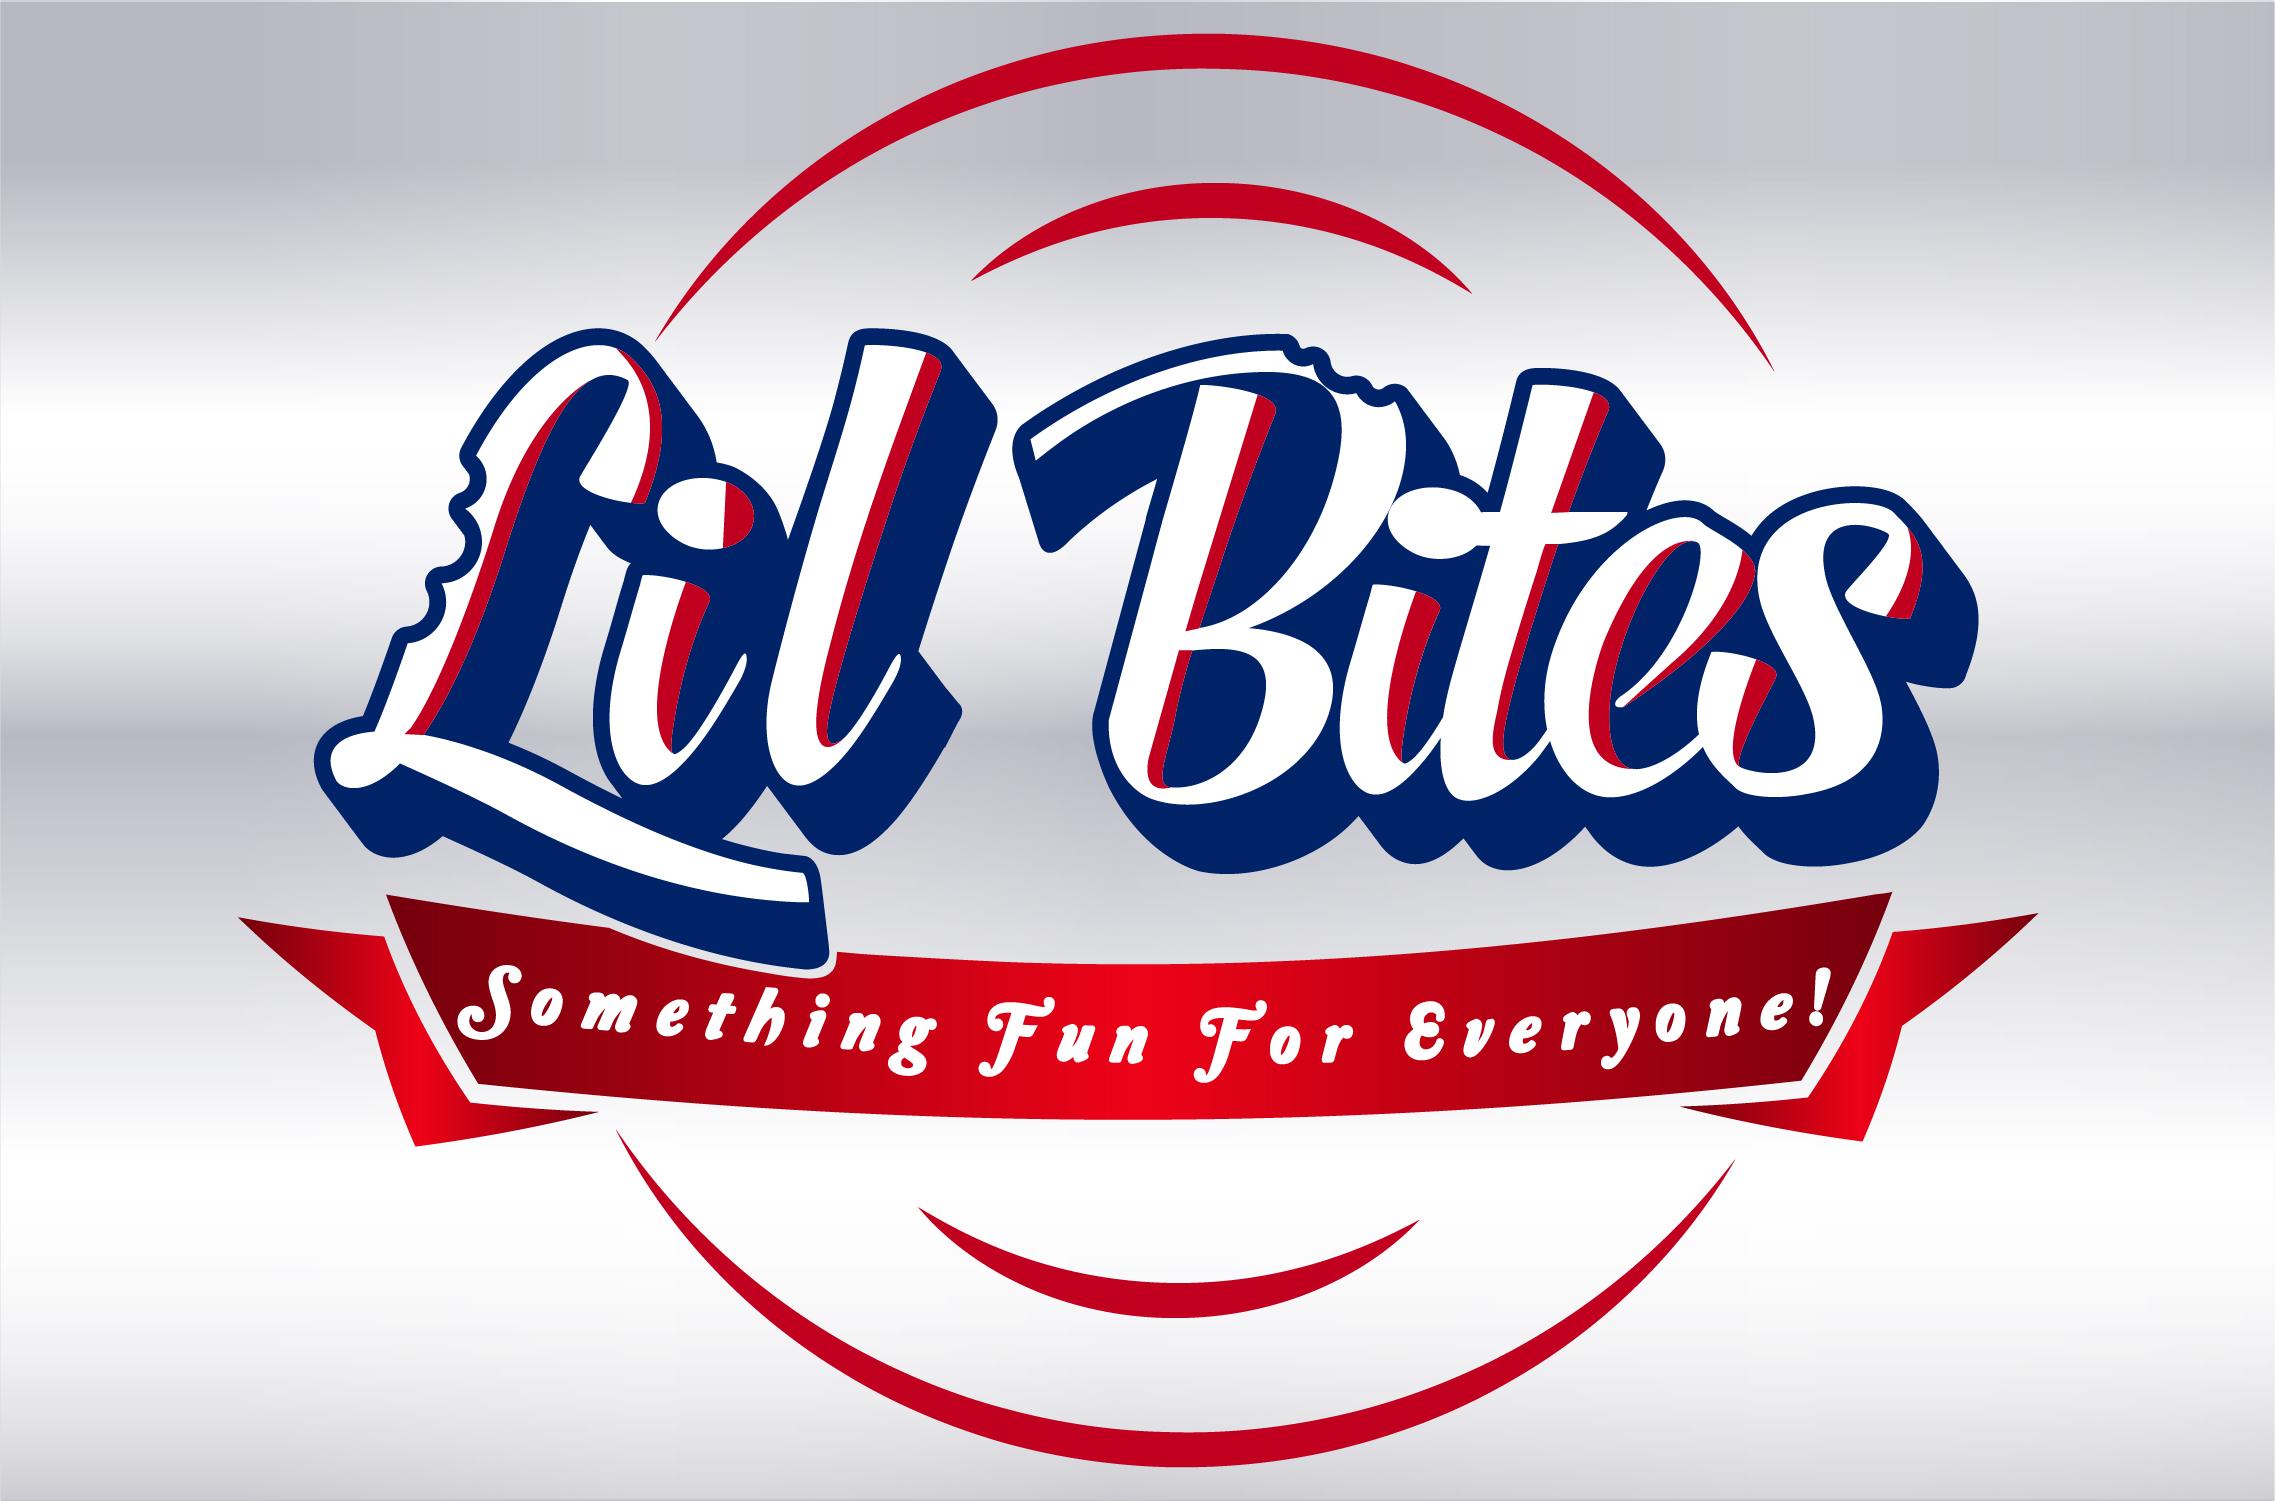 Lil-Bites-2-01